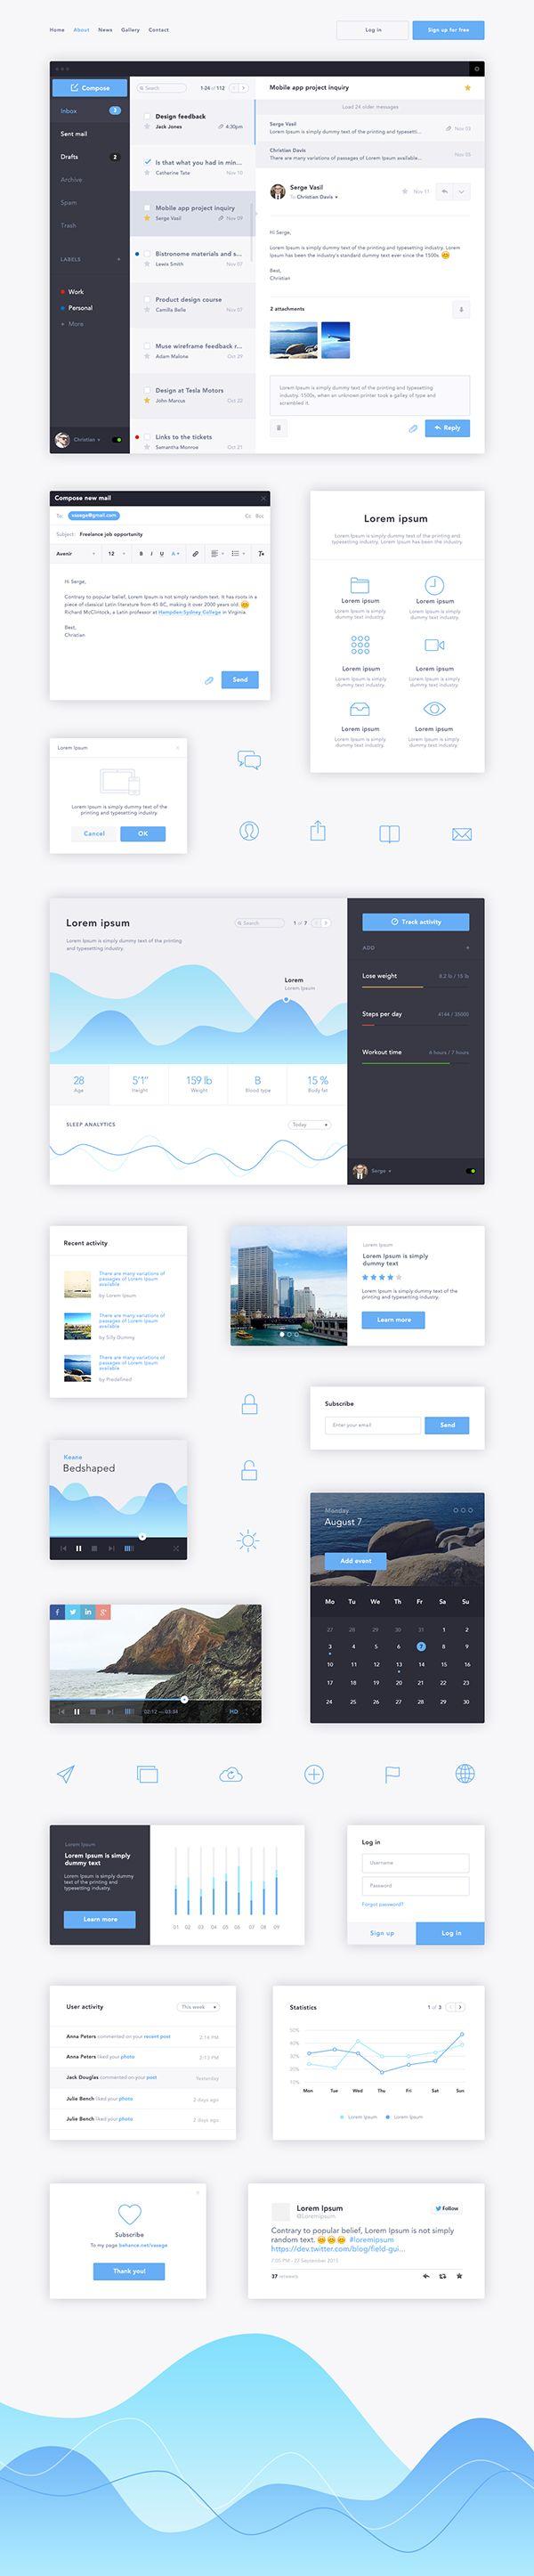 Flat Blue UI Kit on Behance